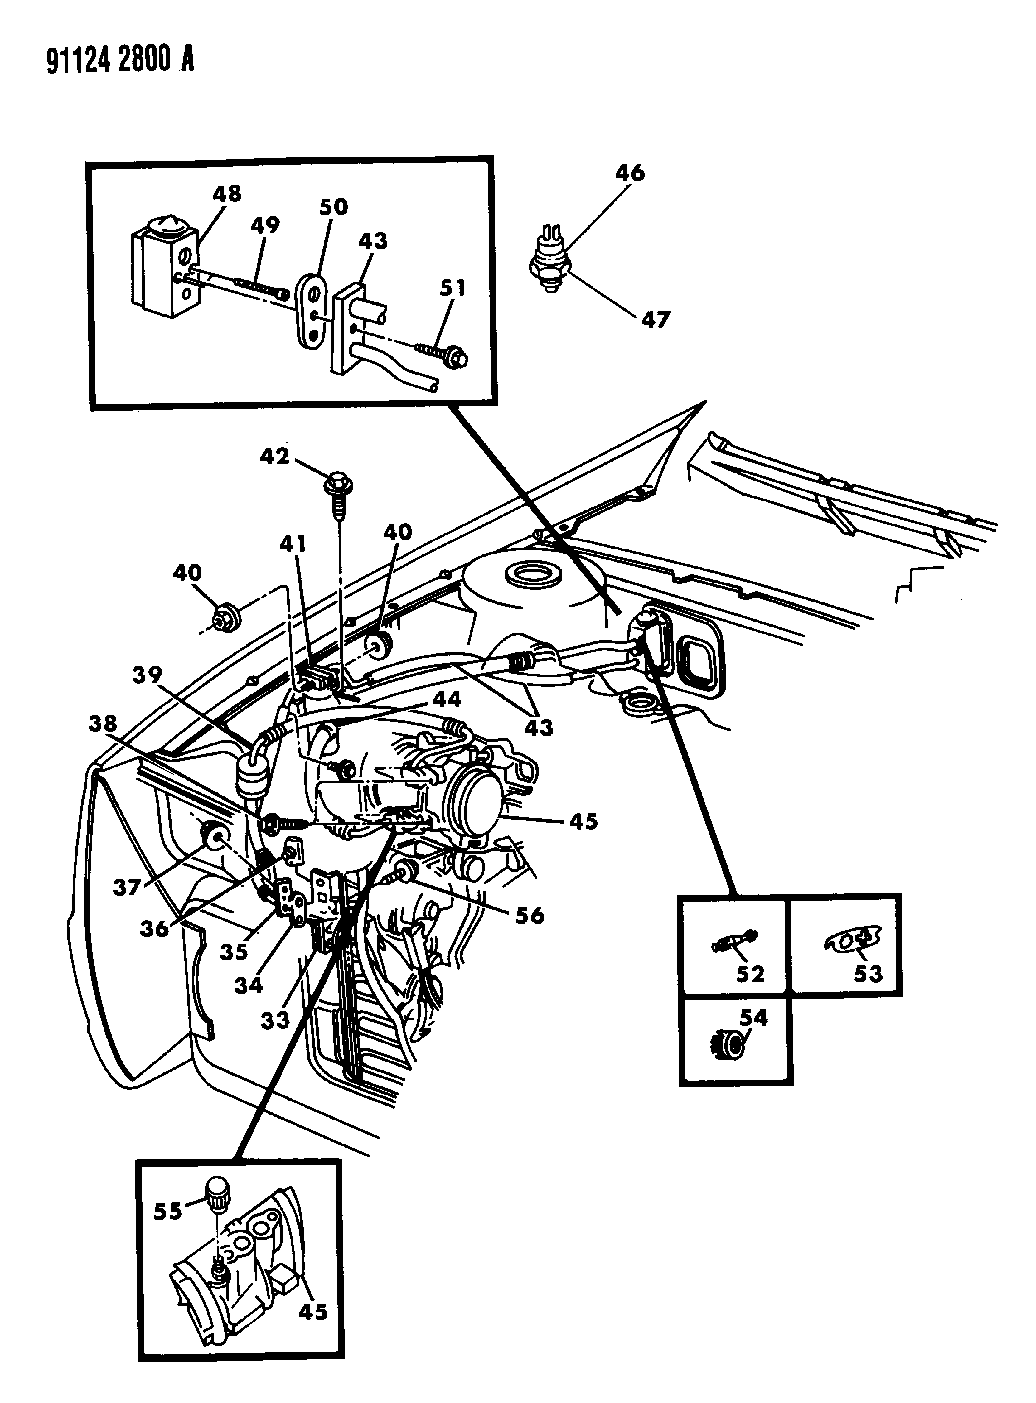 R1017016